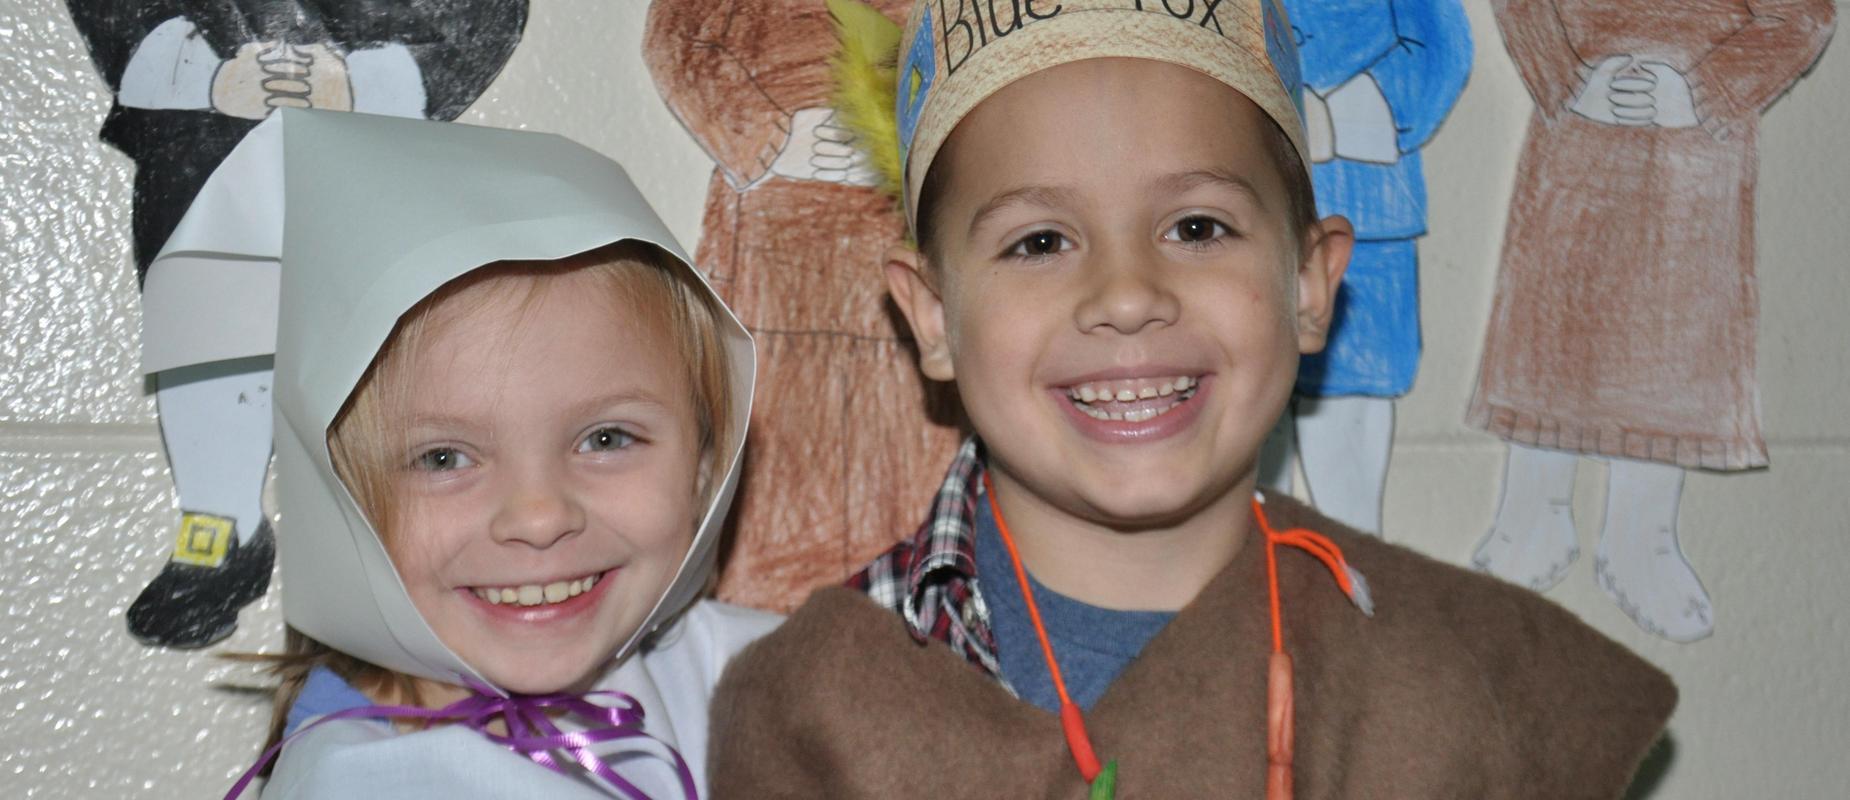 Mission Road Kindergarten students celebrate thanksgiving